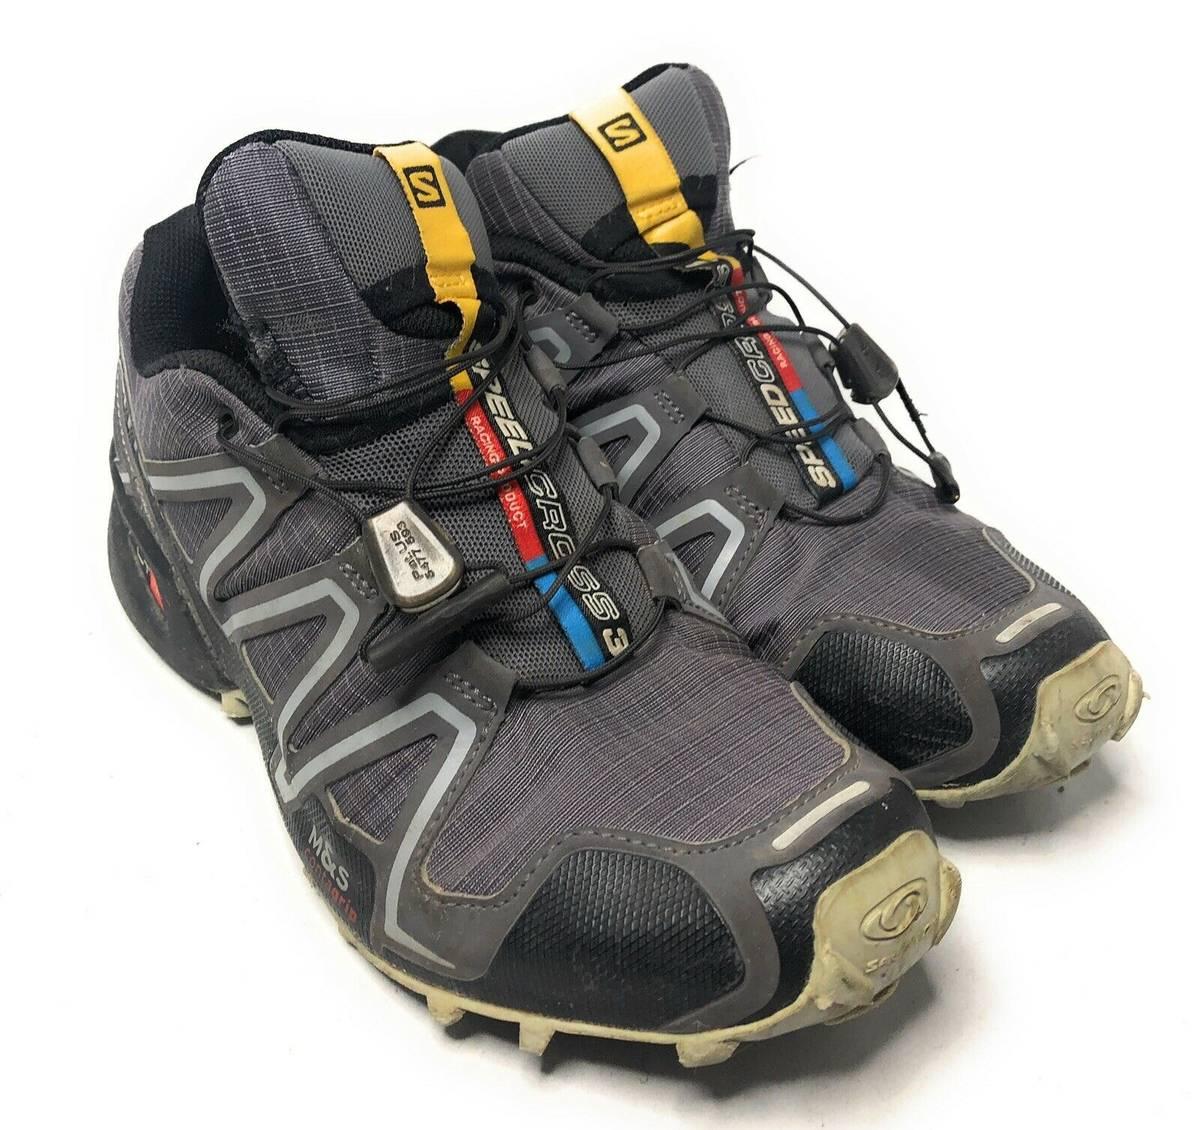 Salomon × Sneakers Salomon Speedcross 3 Men's Trail Running Shoes Size 7 $61